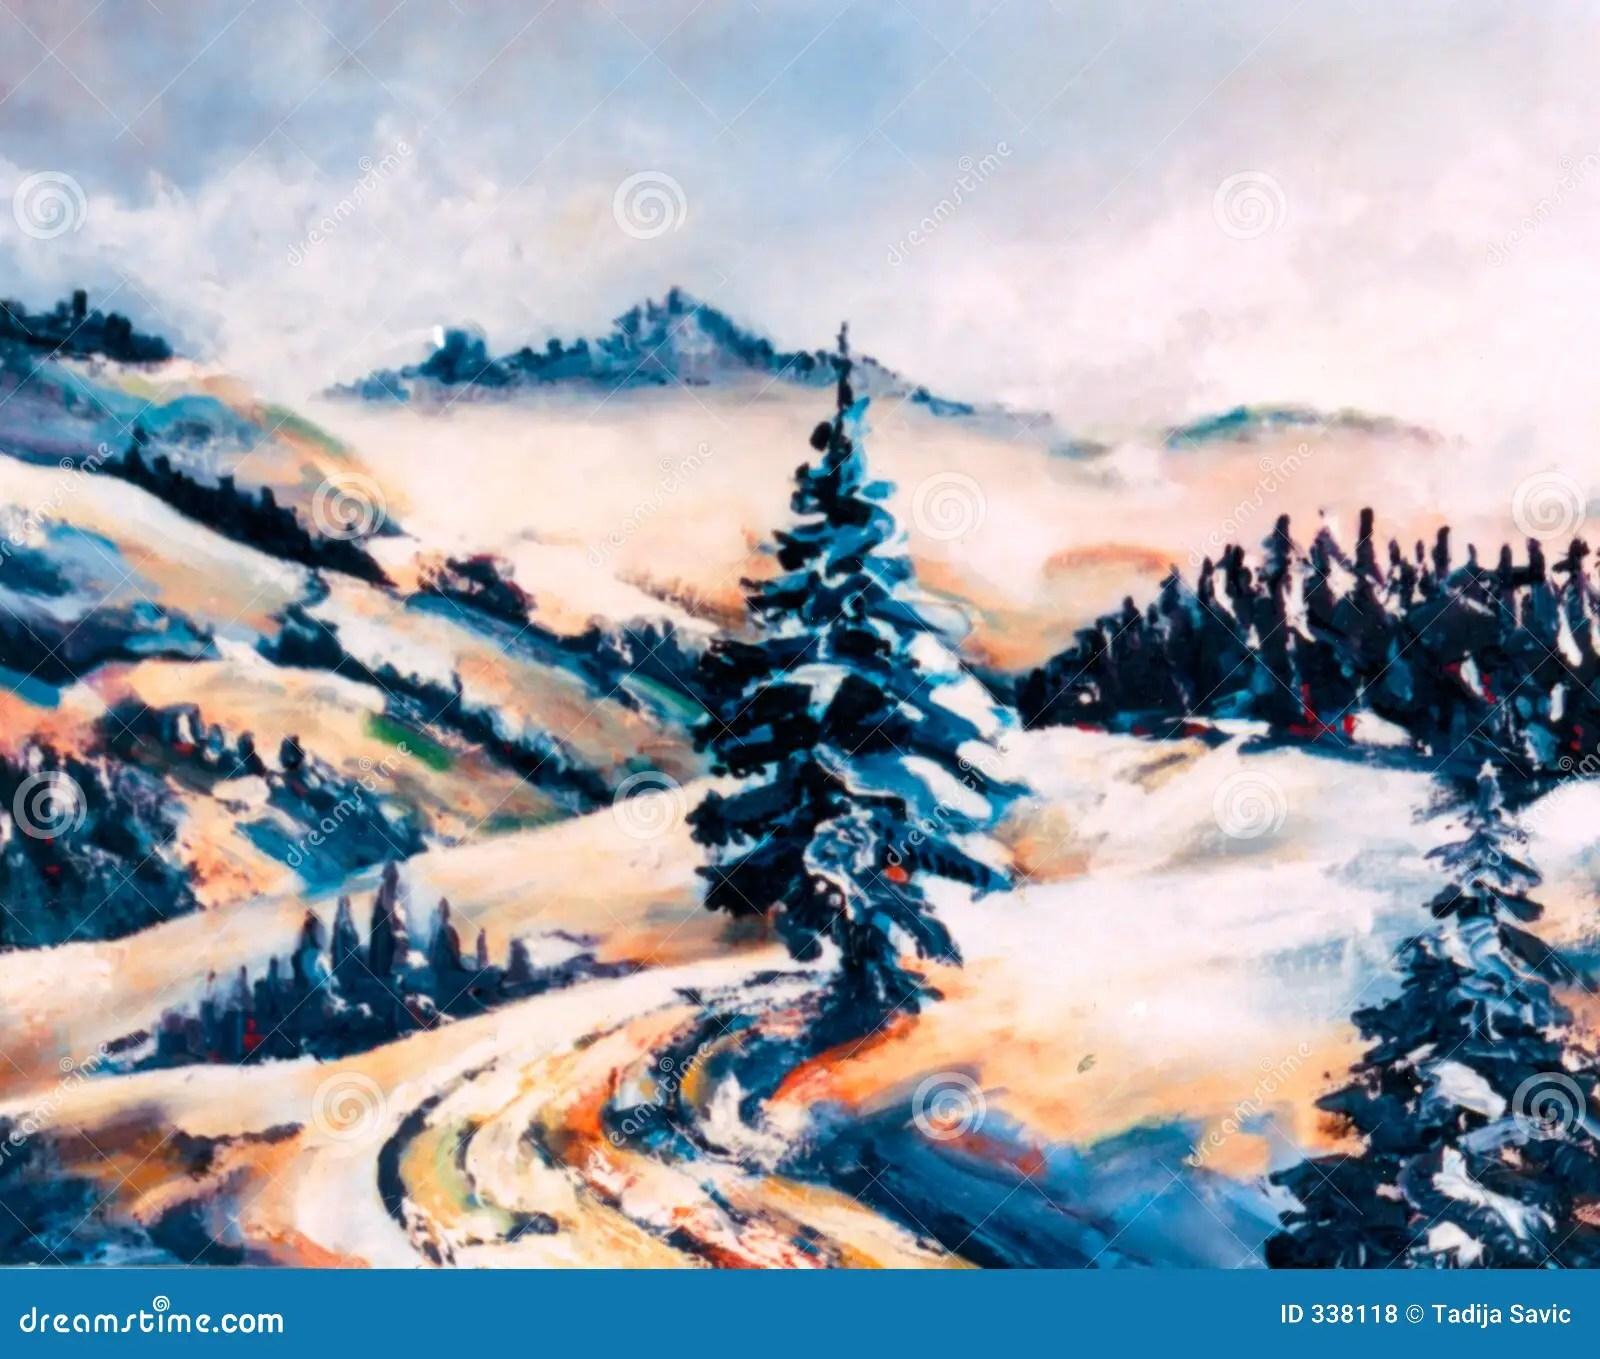 Winter Scene Royalty Free Stock Photos Image 338118